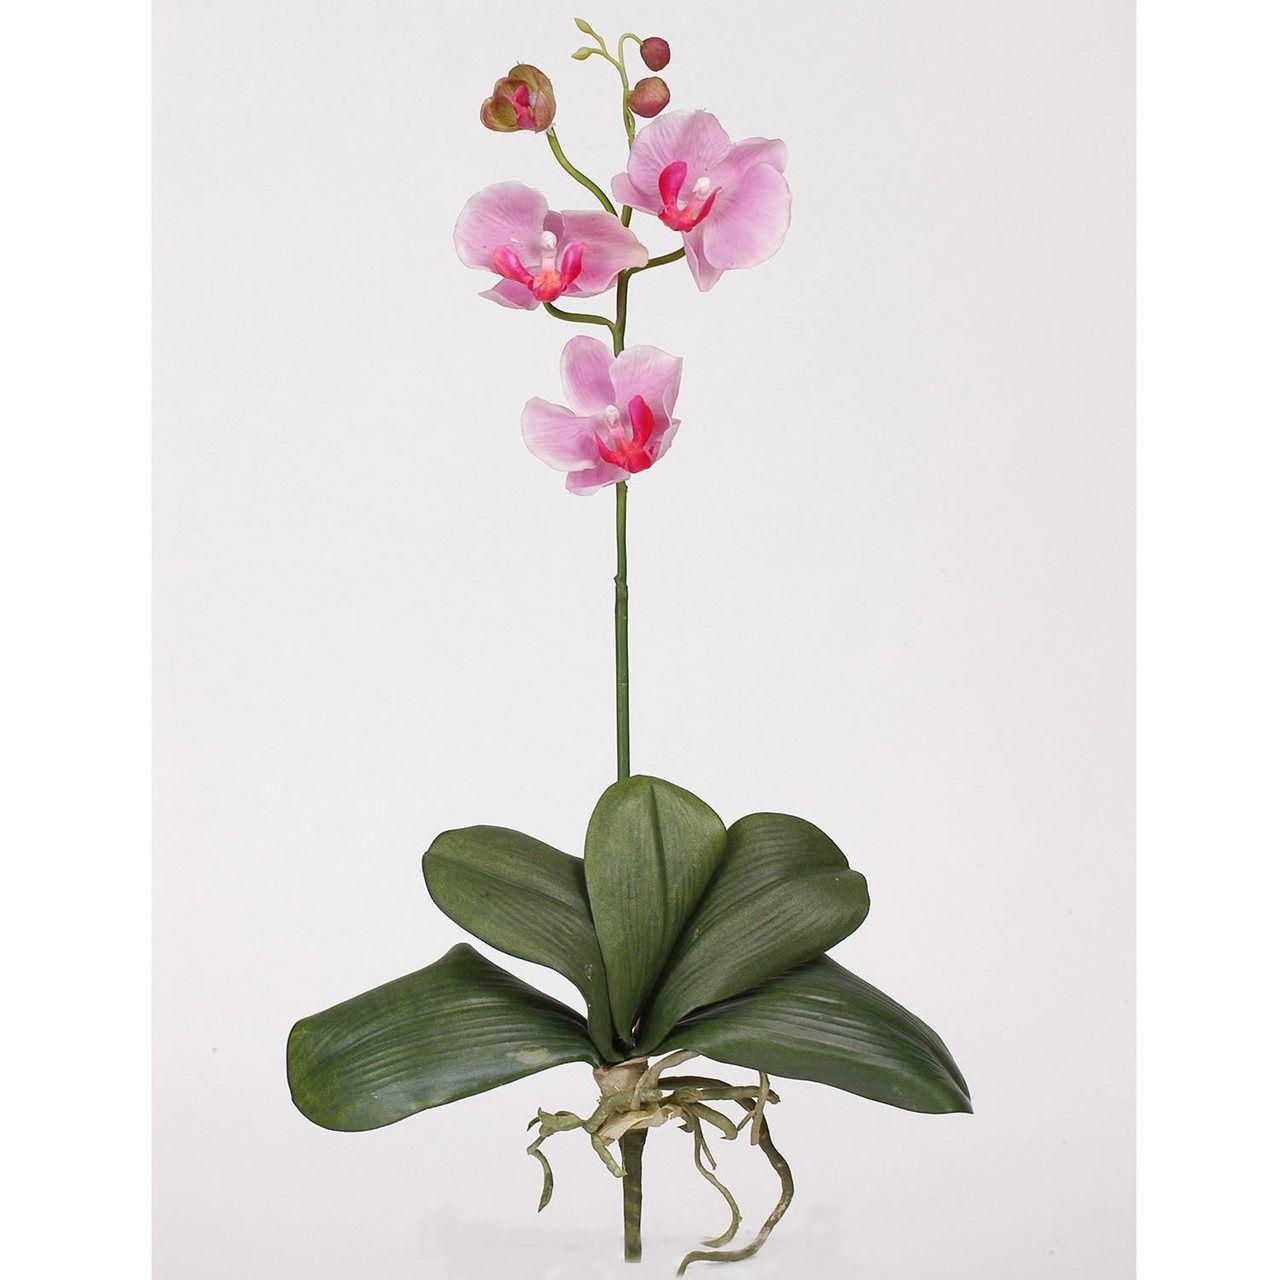 TheMainHut - Mini Phalaenopsis Silk Orchid Flower w/Leaves (6 Stems), $45.89 (http://www.themainhut.com/mini-phalaenopsis-silk-orchid-flower-w-leaves-6-stems/)